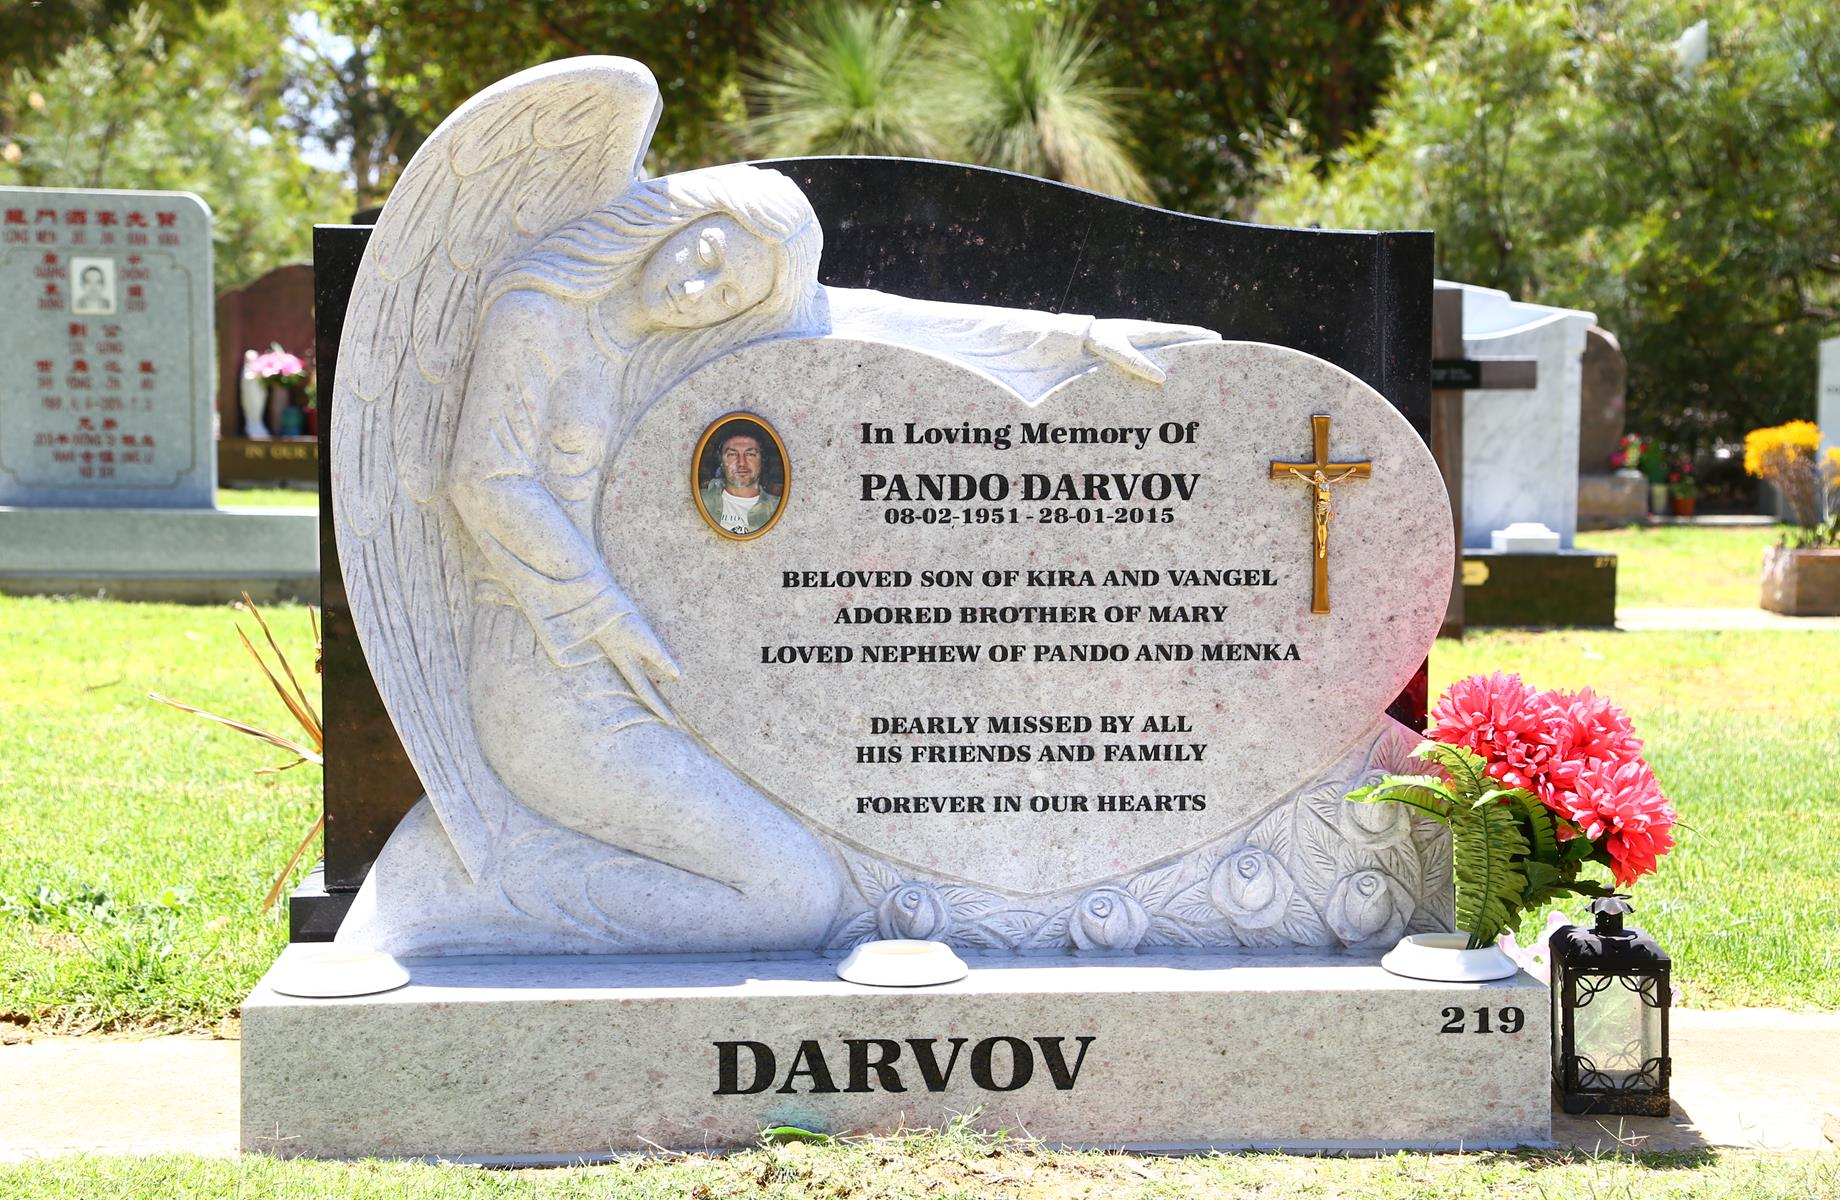 Darvov